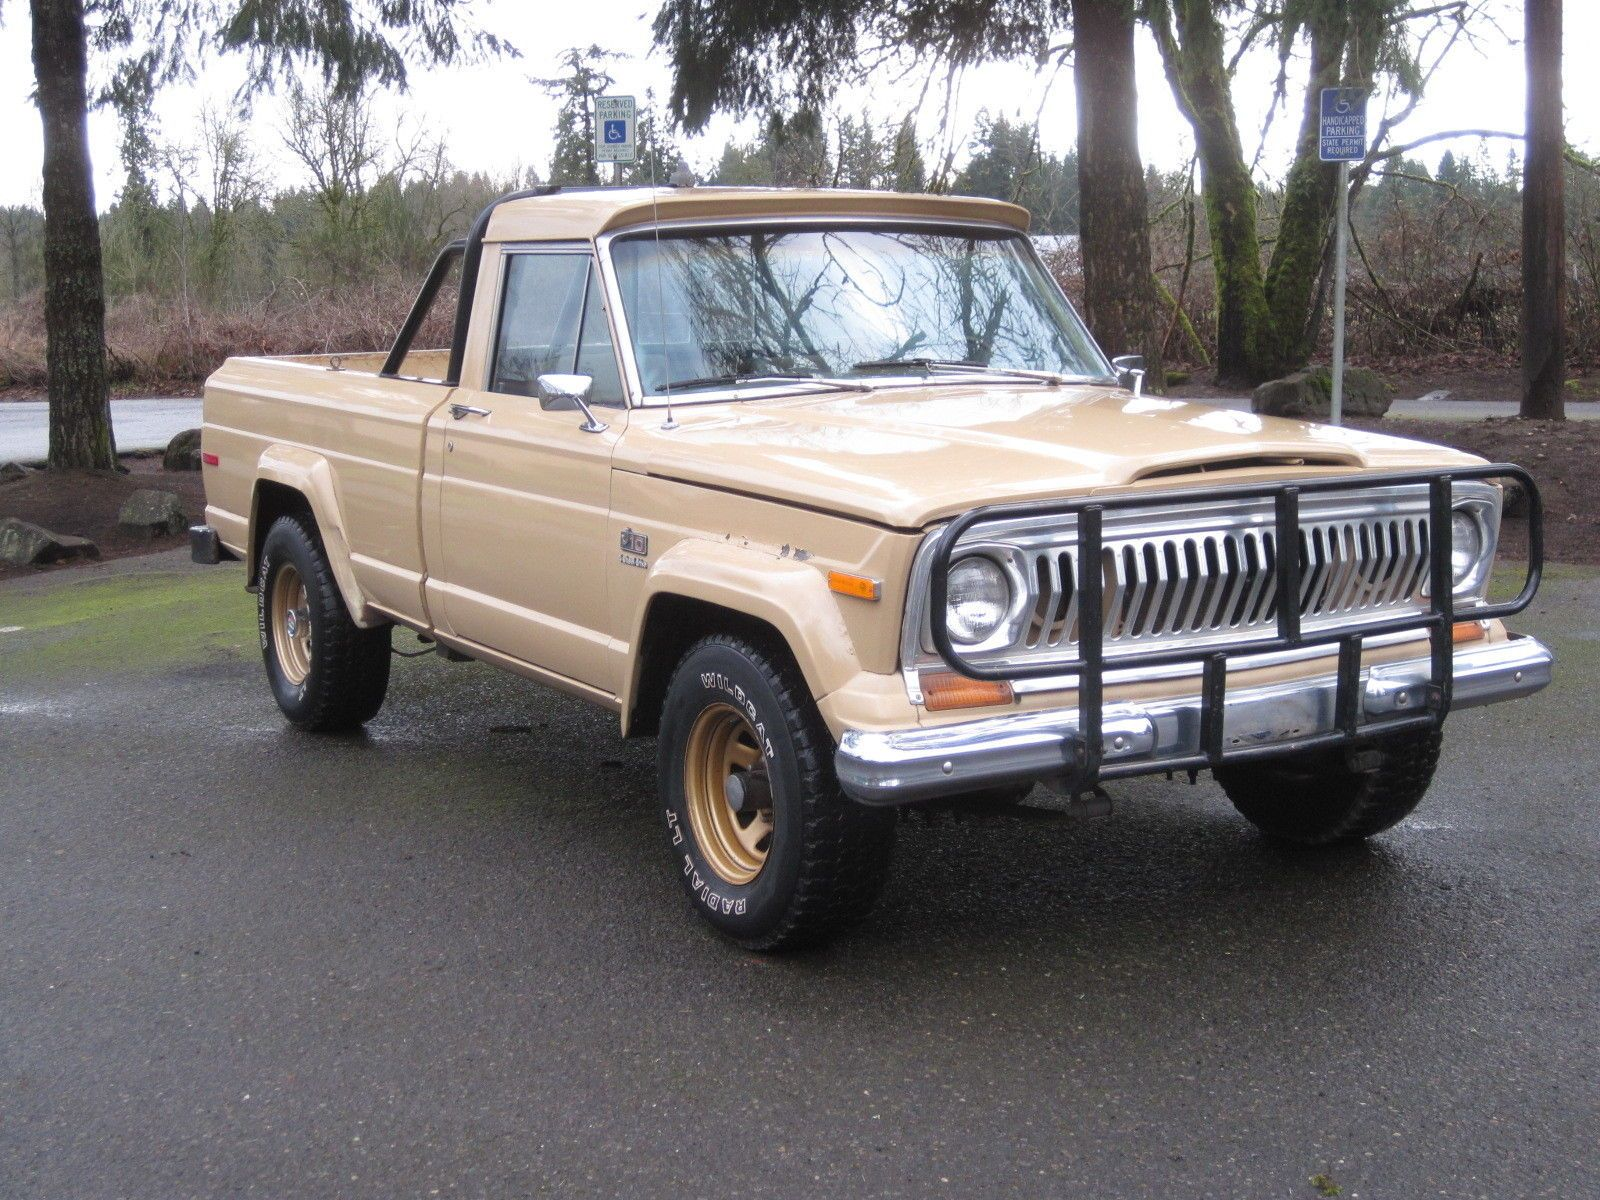 78 jeep j10 golden eagle  [ 1600 x 1200 Pixel ]